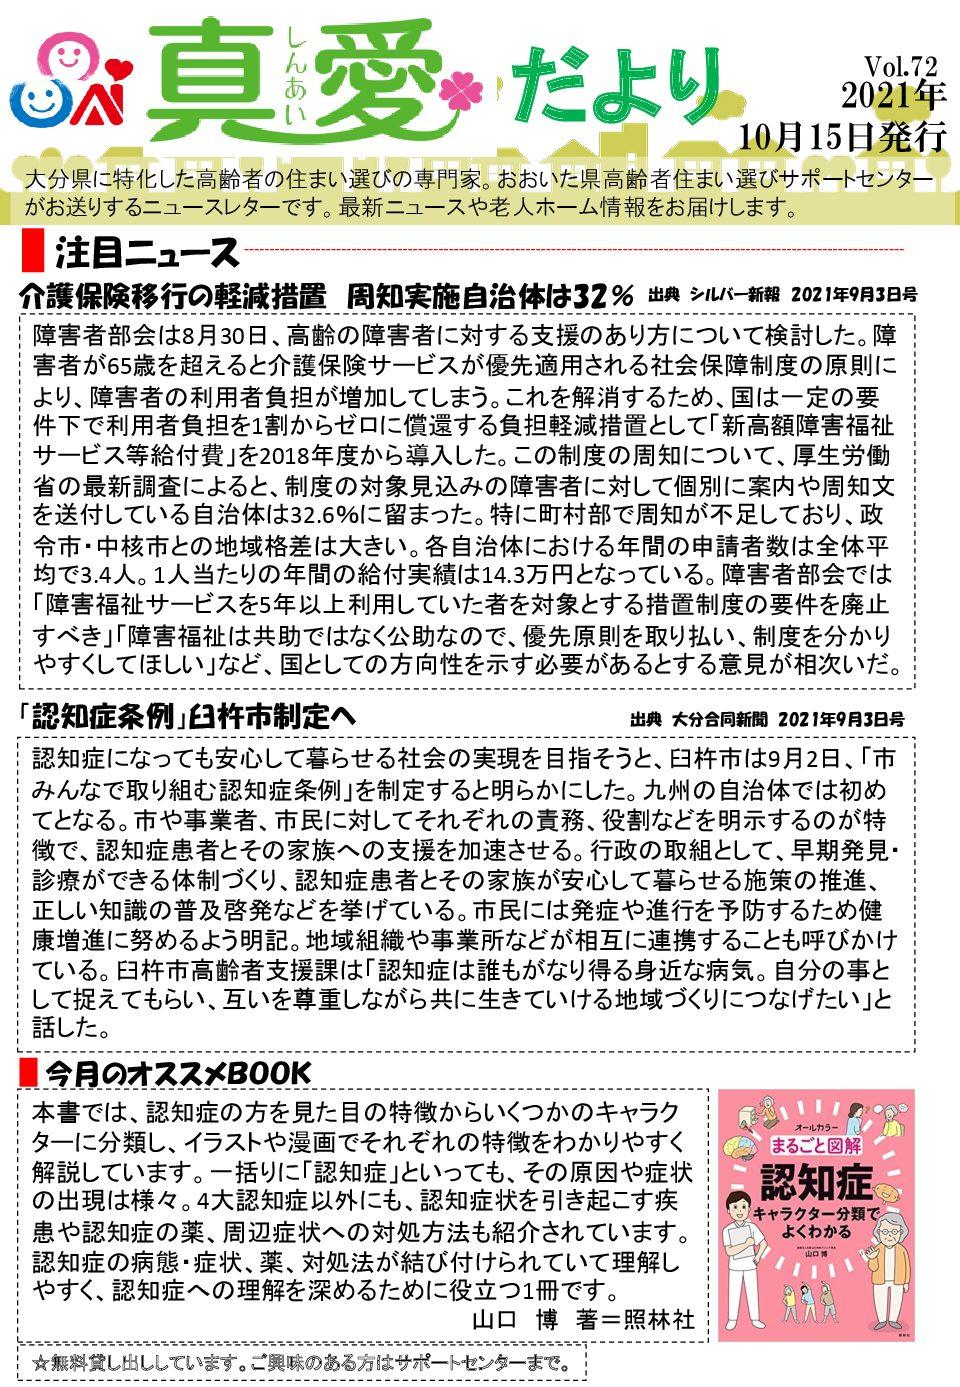 【Vol.72】 2021.10.15発行